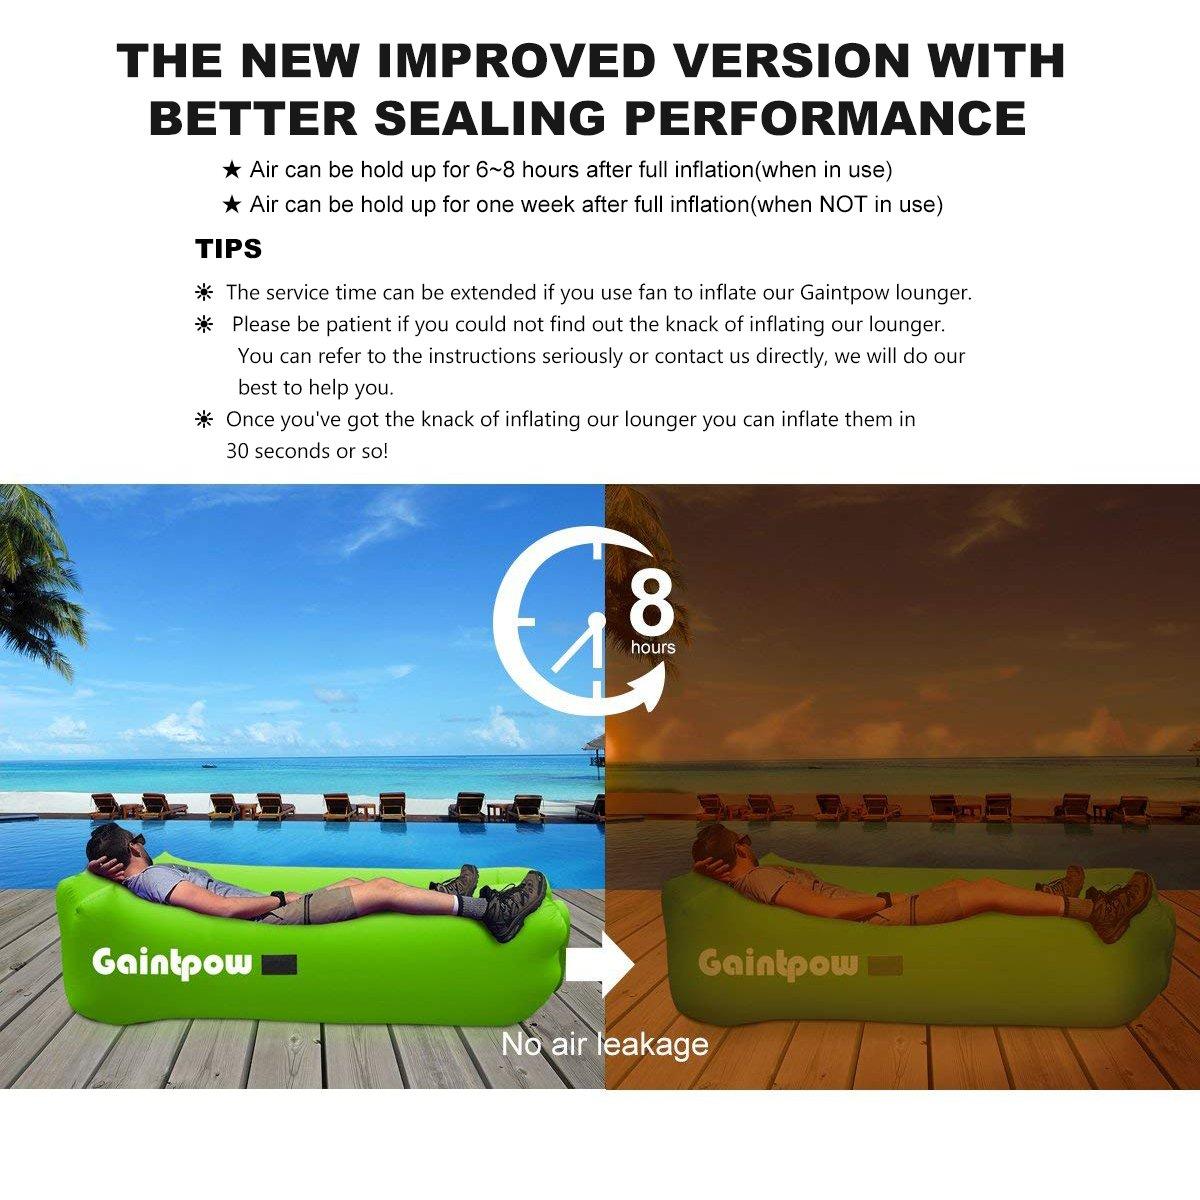 Verde Impermeable con Tela m/ás Gruesa port/átil Gaintpow Tumbona Inflable soporta hasta 500 Libras Piscina Playa Senderismo sof/á Inflable sof/á para Camping